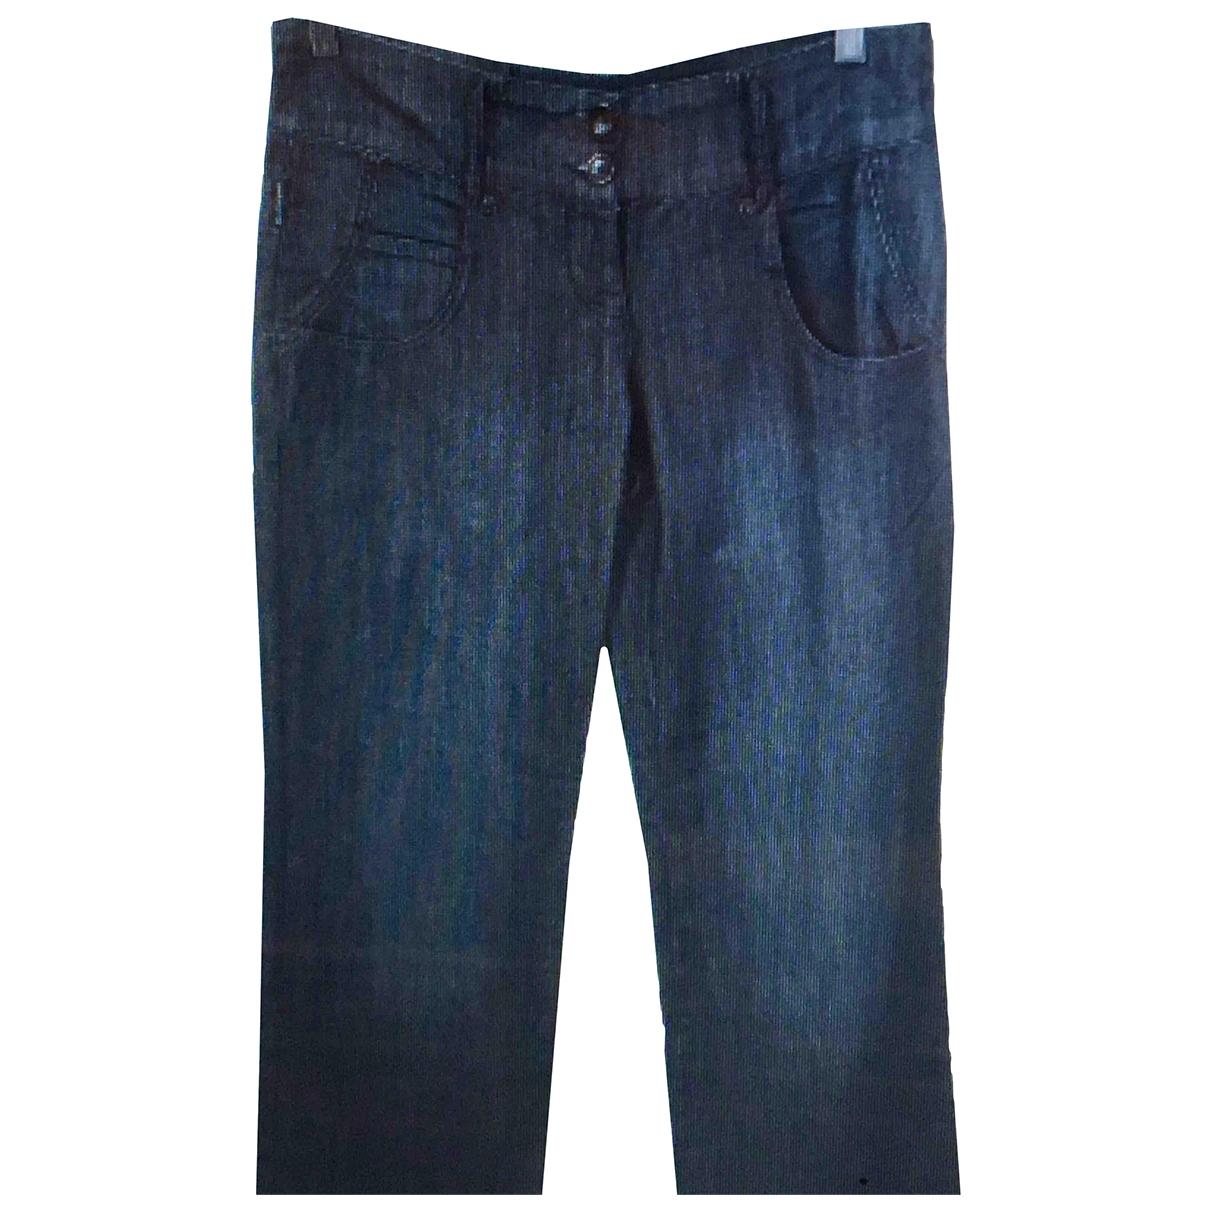 Pantalon corto Armani Jeans